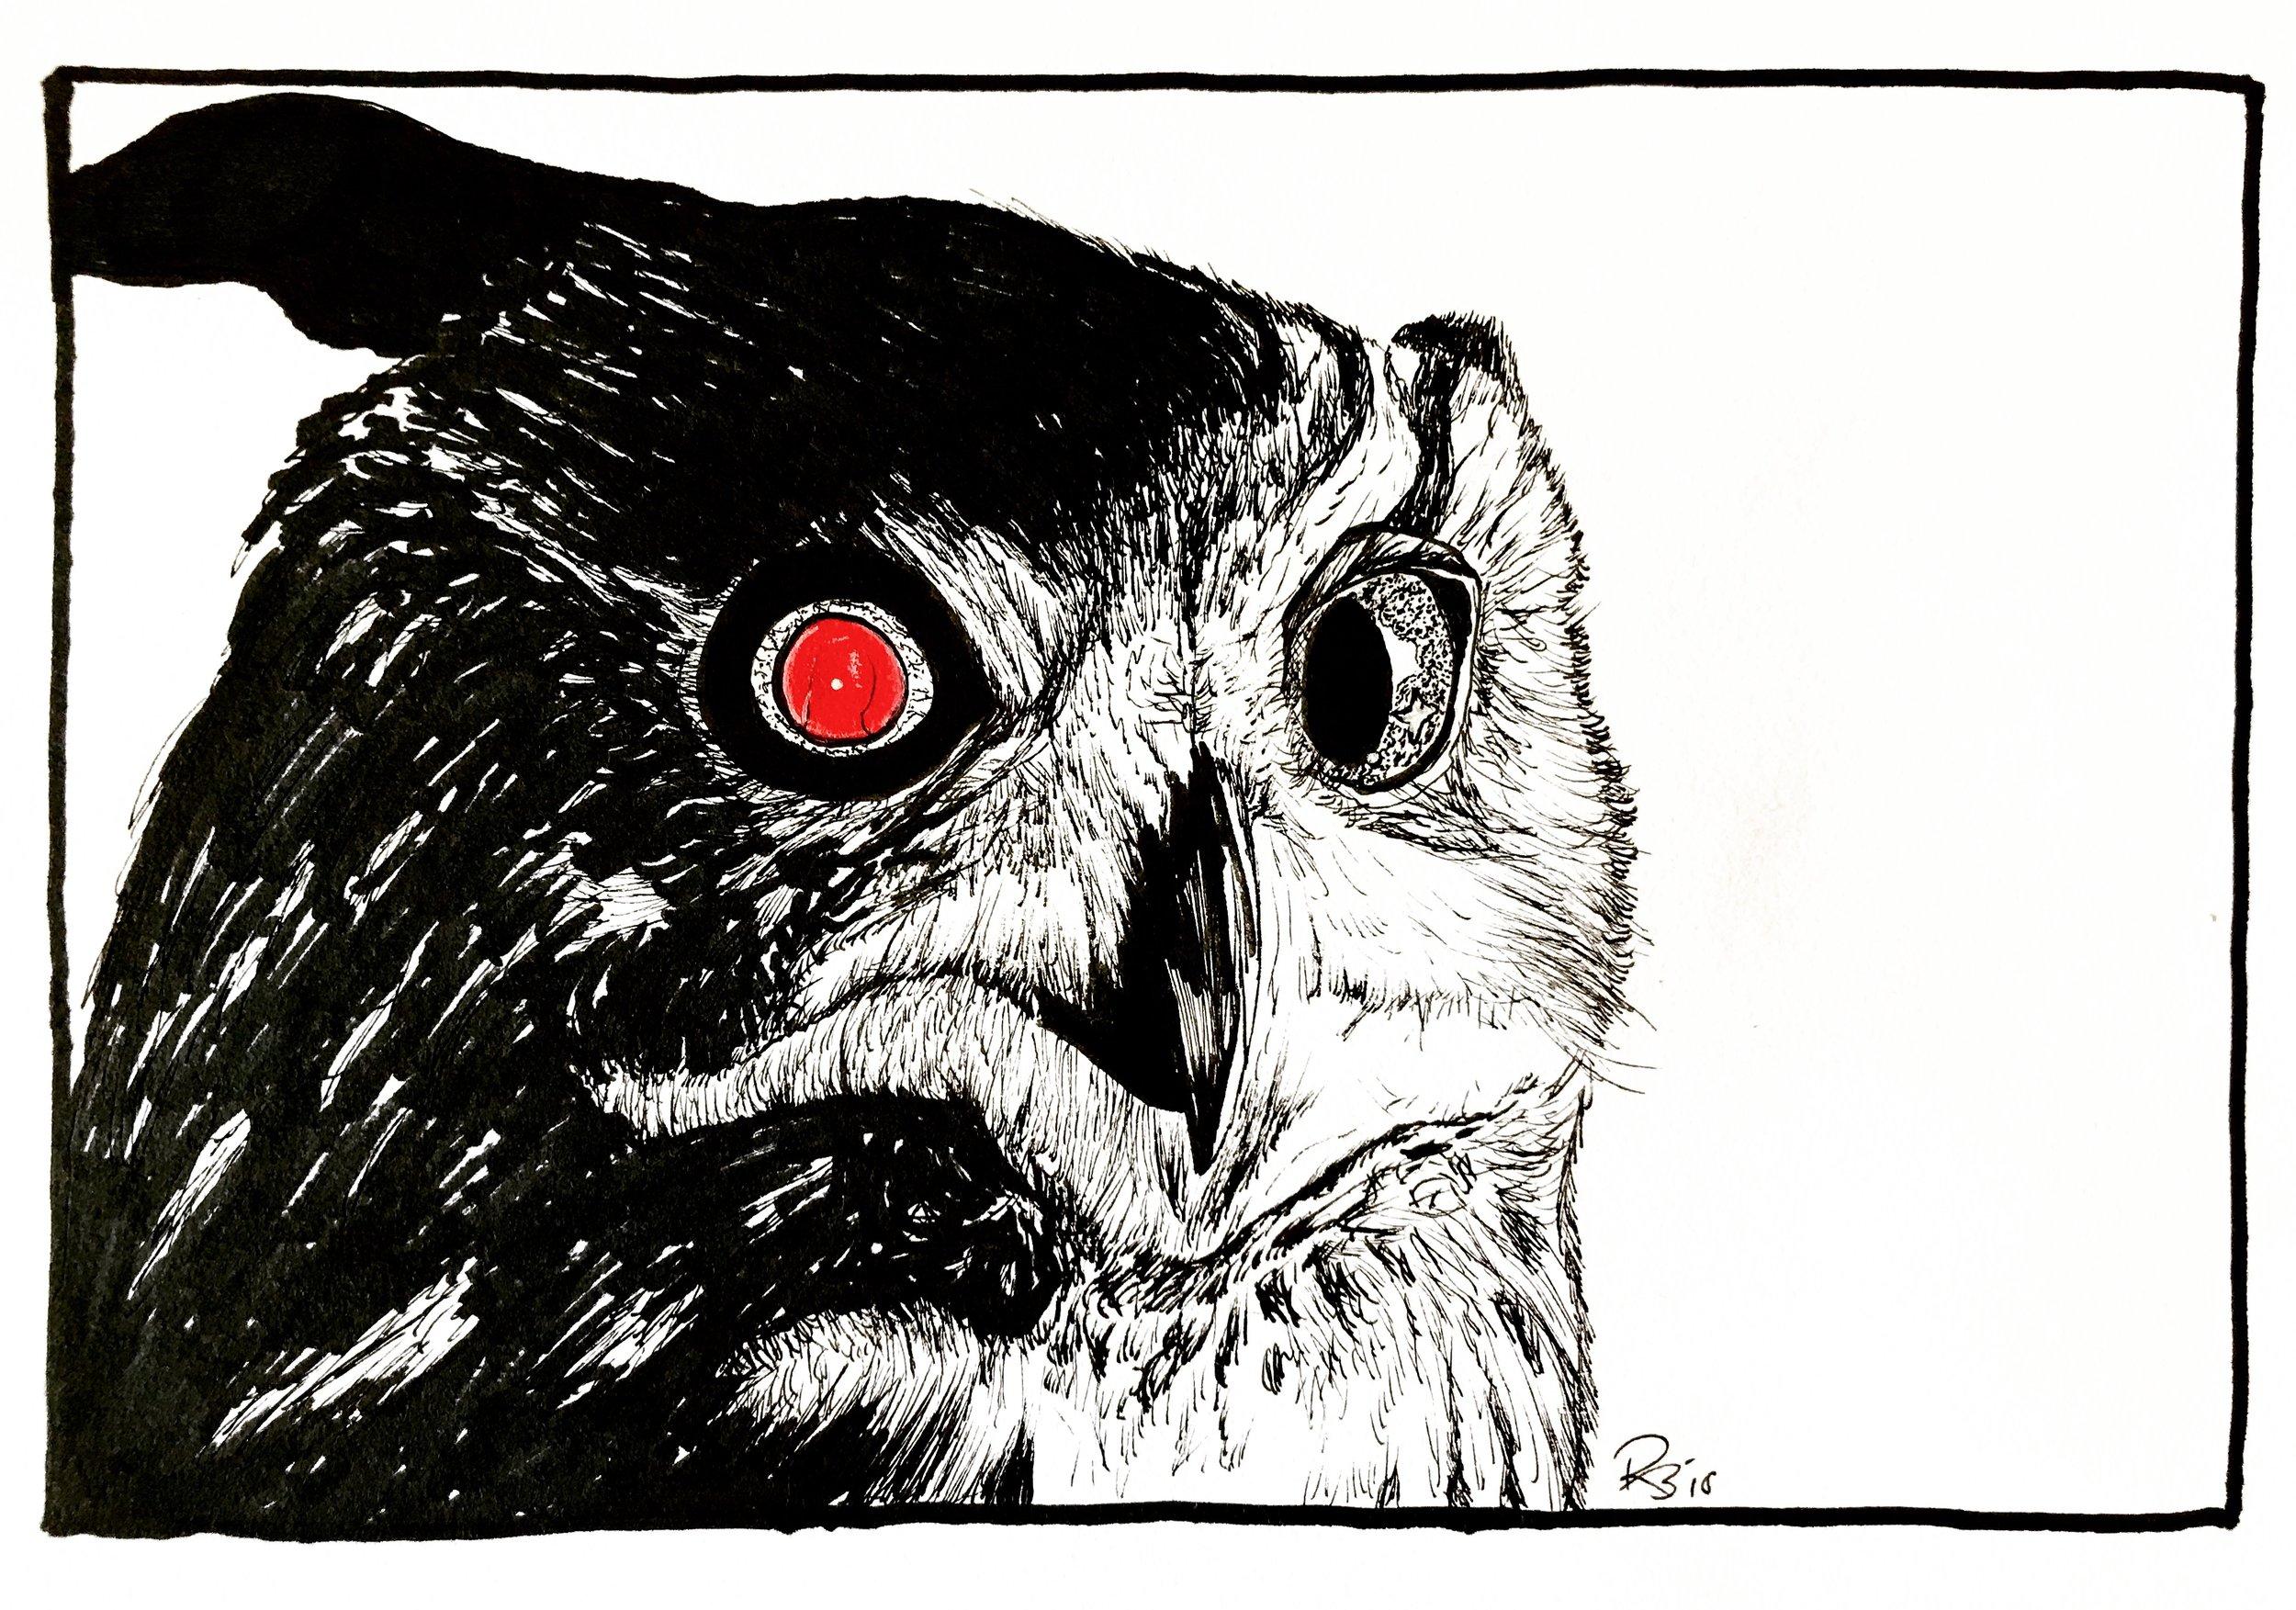 Tyrell's Owl